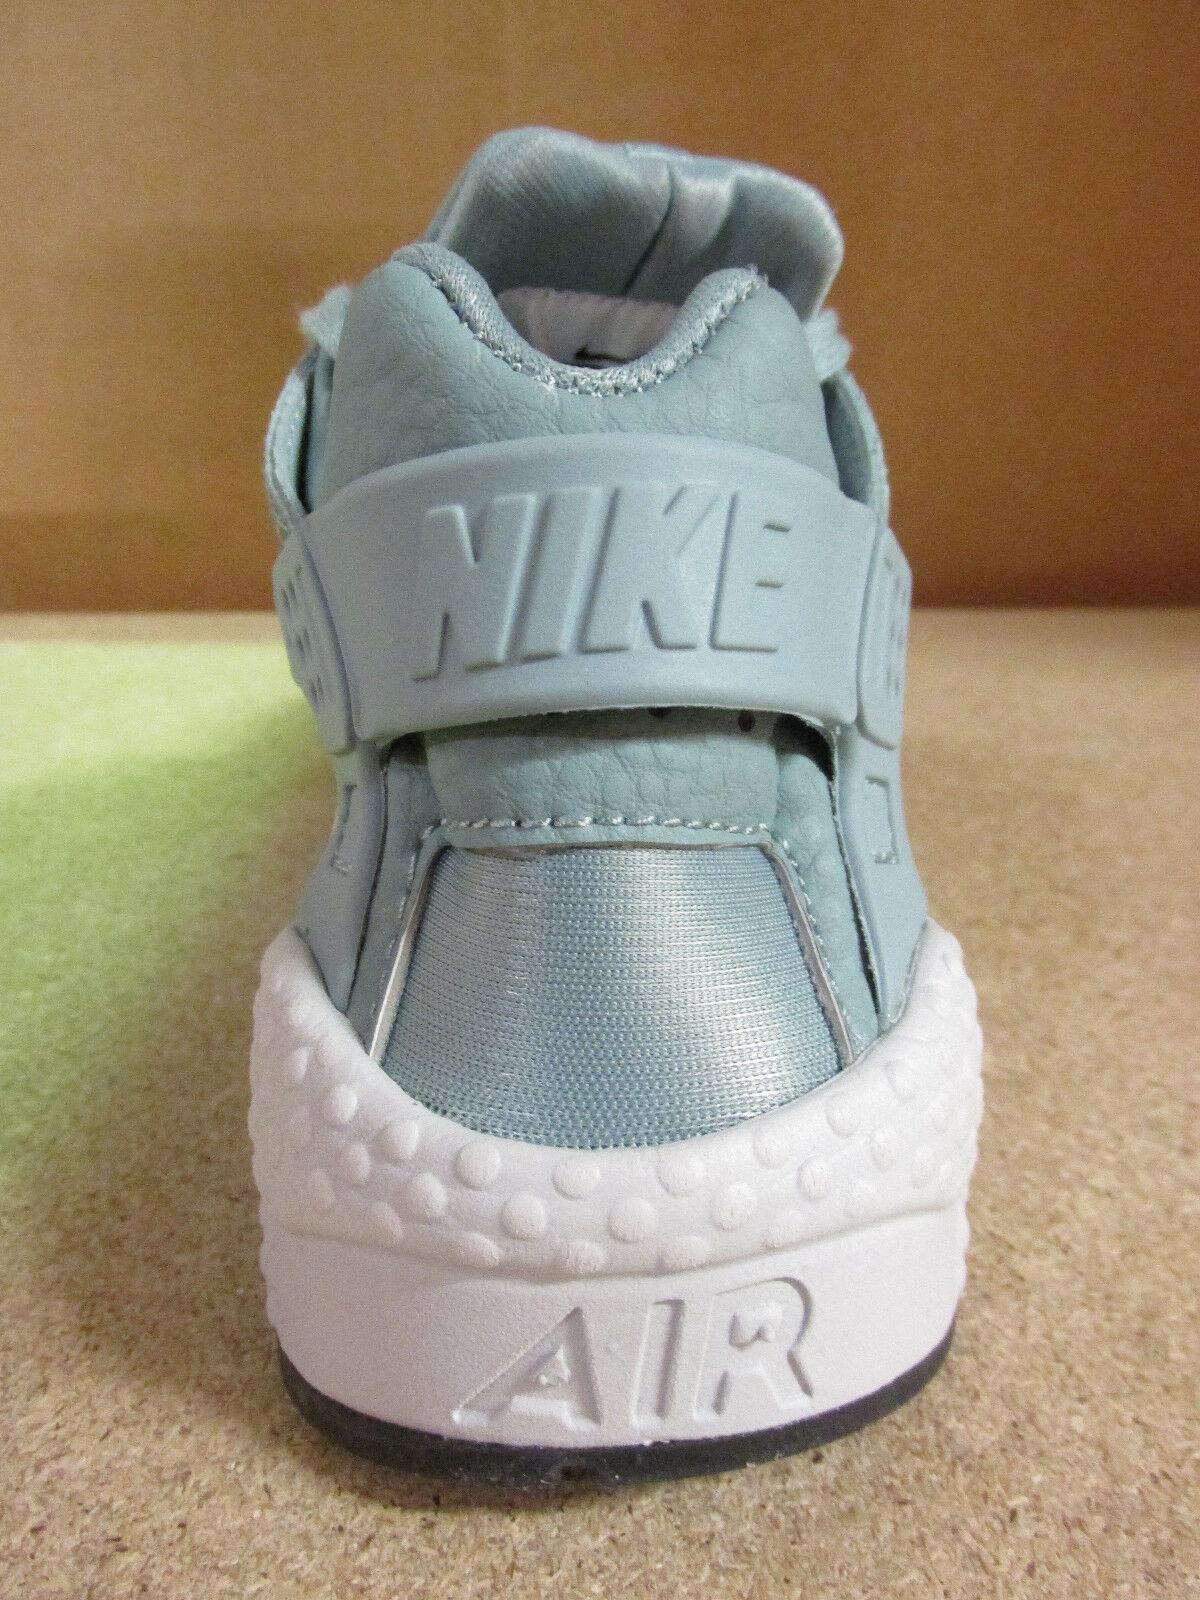 Nike femme air huarache huarache huarache run print running baskets 725076 006 baskets chaussures 860cd3